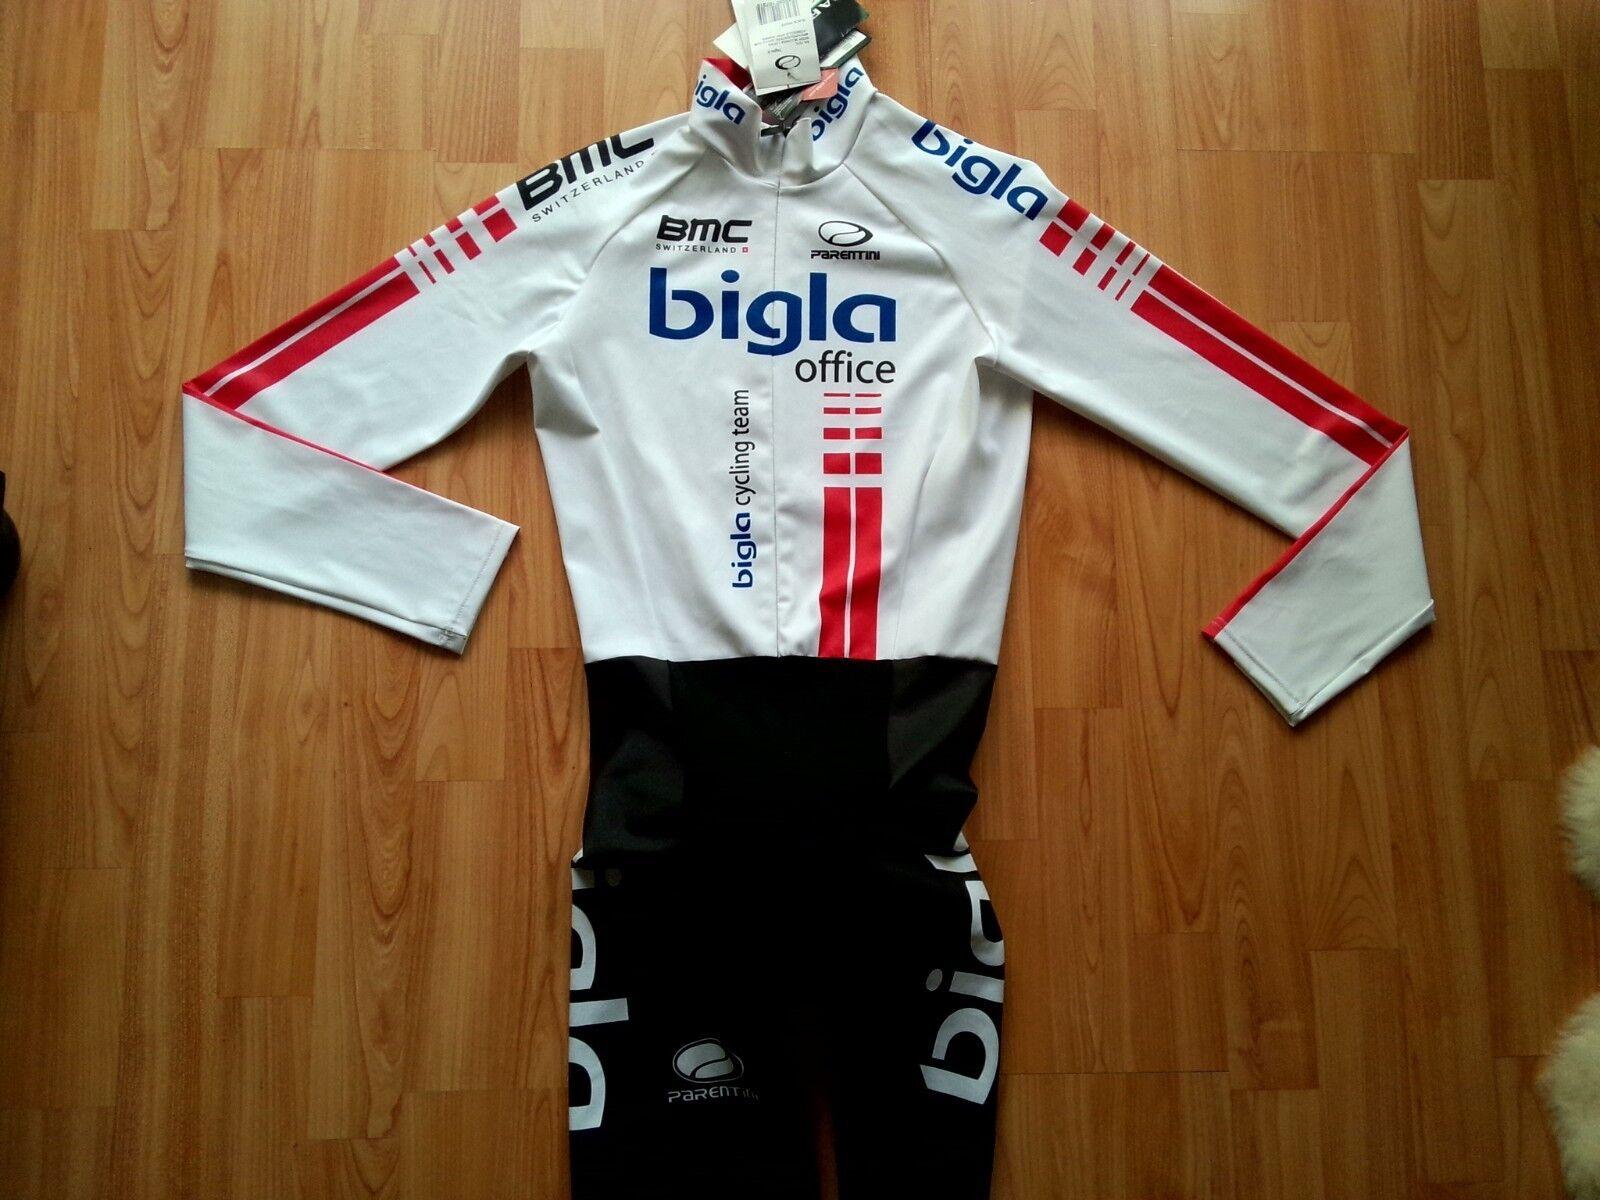 BMC Bigla Cycling Team Womens Long Sleeve Skinsuit Chronosuit  Parentini Size  S